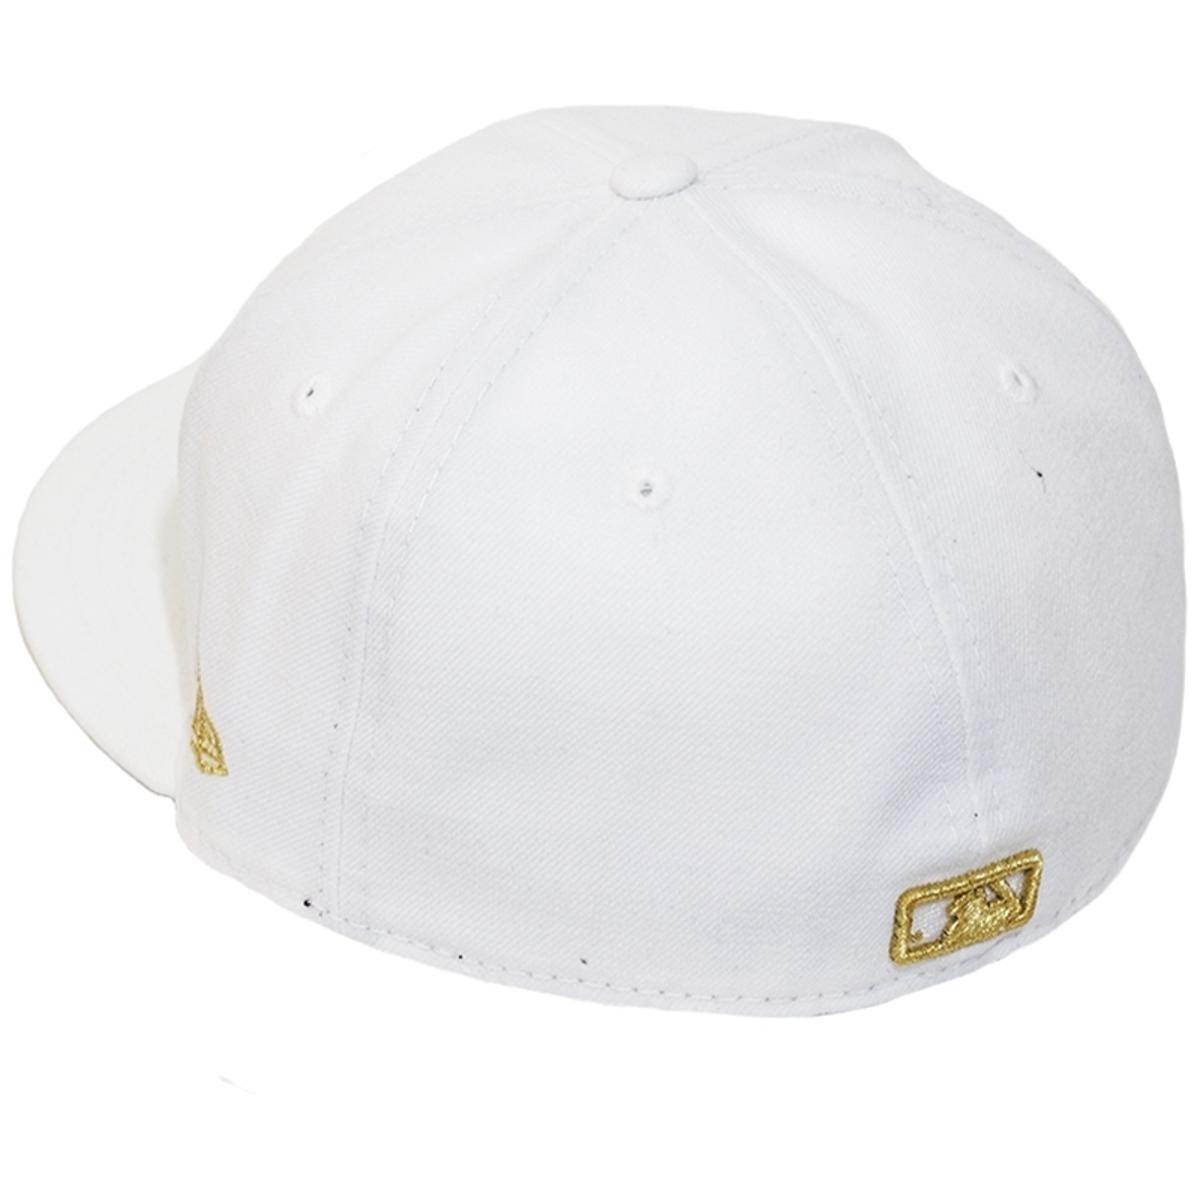 Boné New Era Aba Reta Fechado Mlb Astros Basic Gold - Compre Agora ... 3b1cc103615